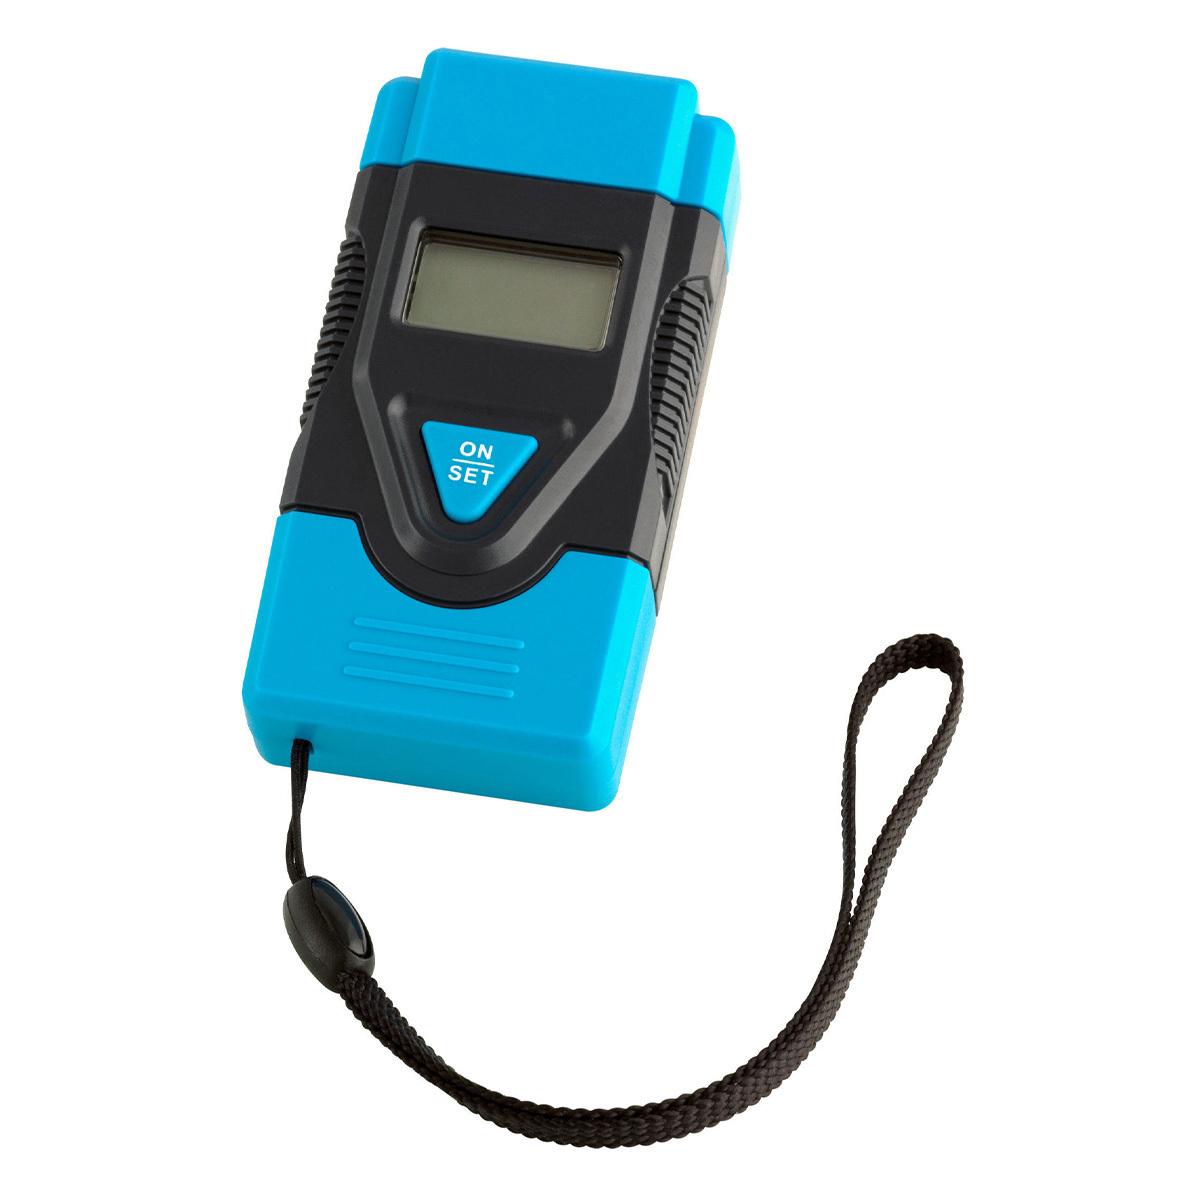 30-5502-materialfeuchtemessgerät-humidcheck-mini-1200x1200px.jpg